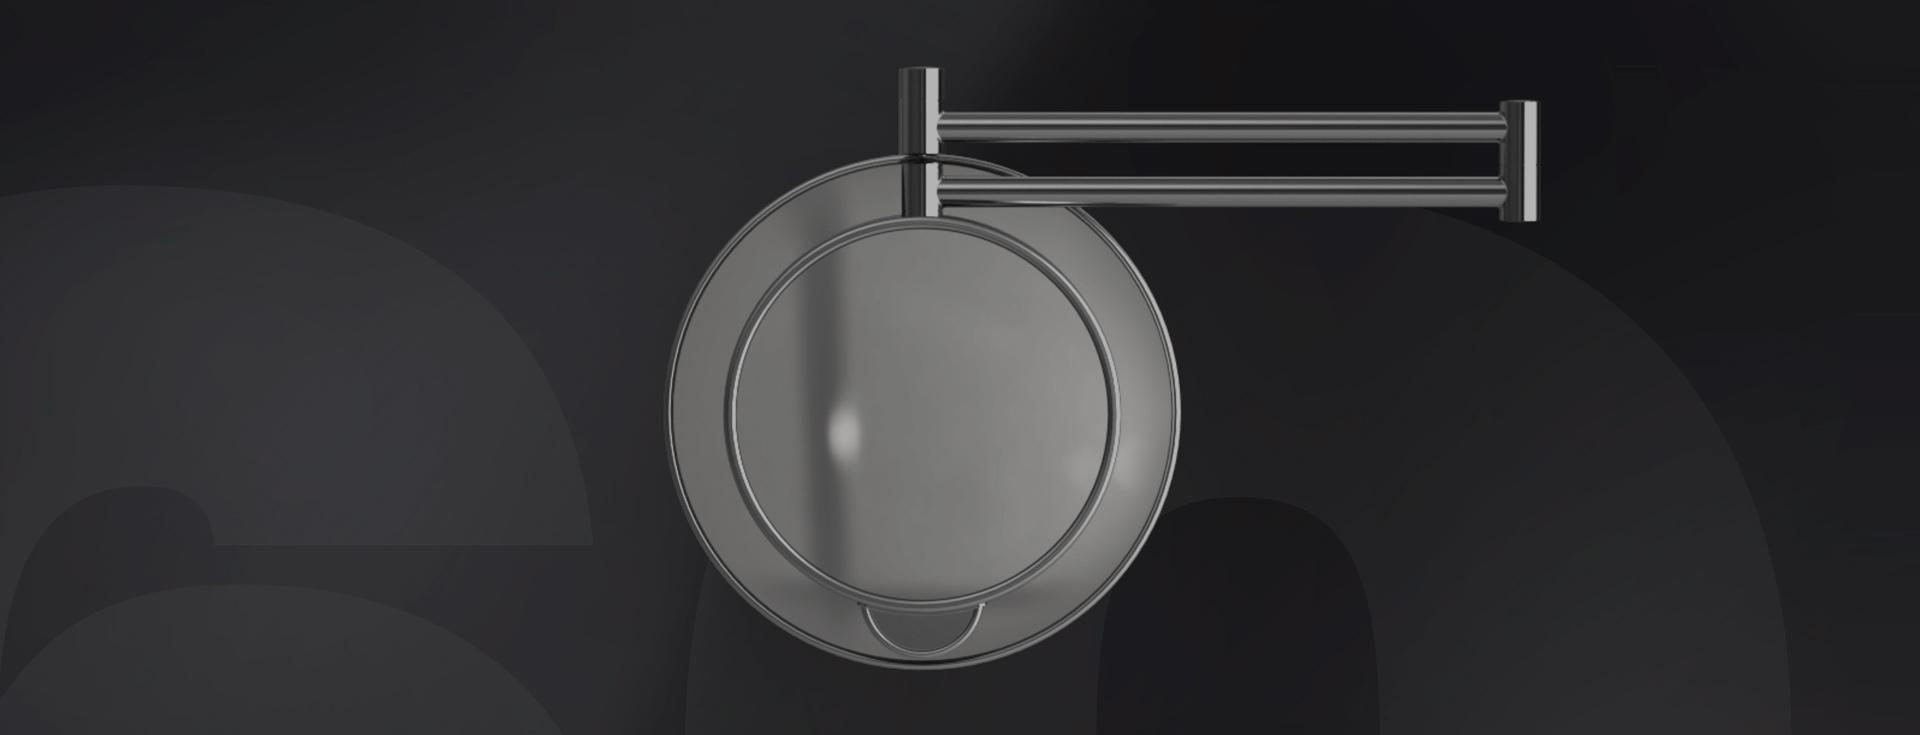 My 360° Mirror